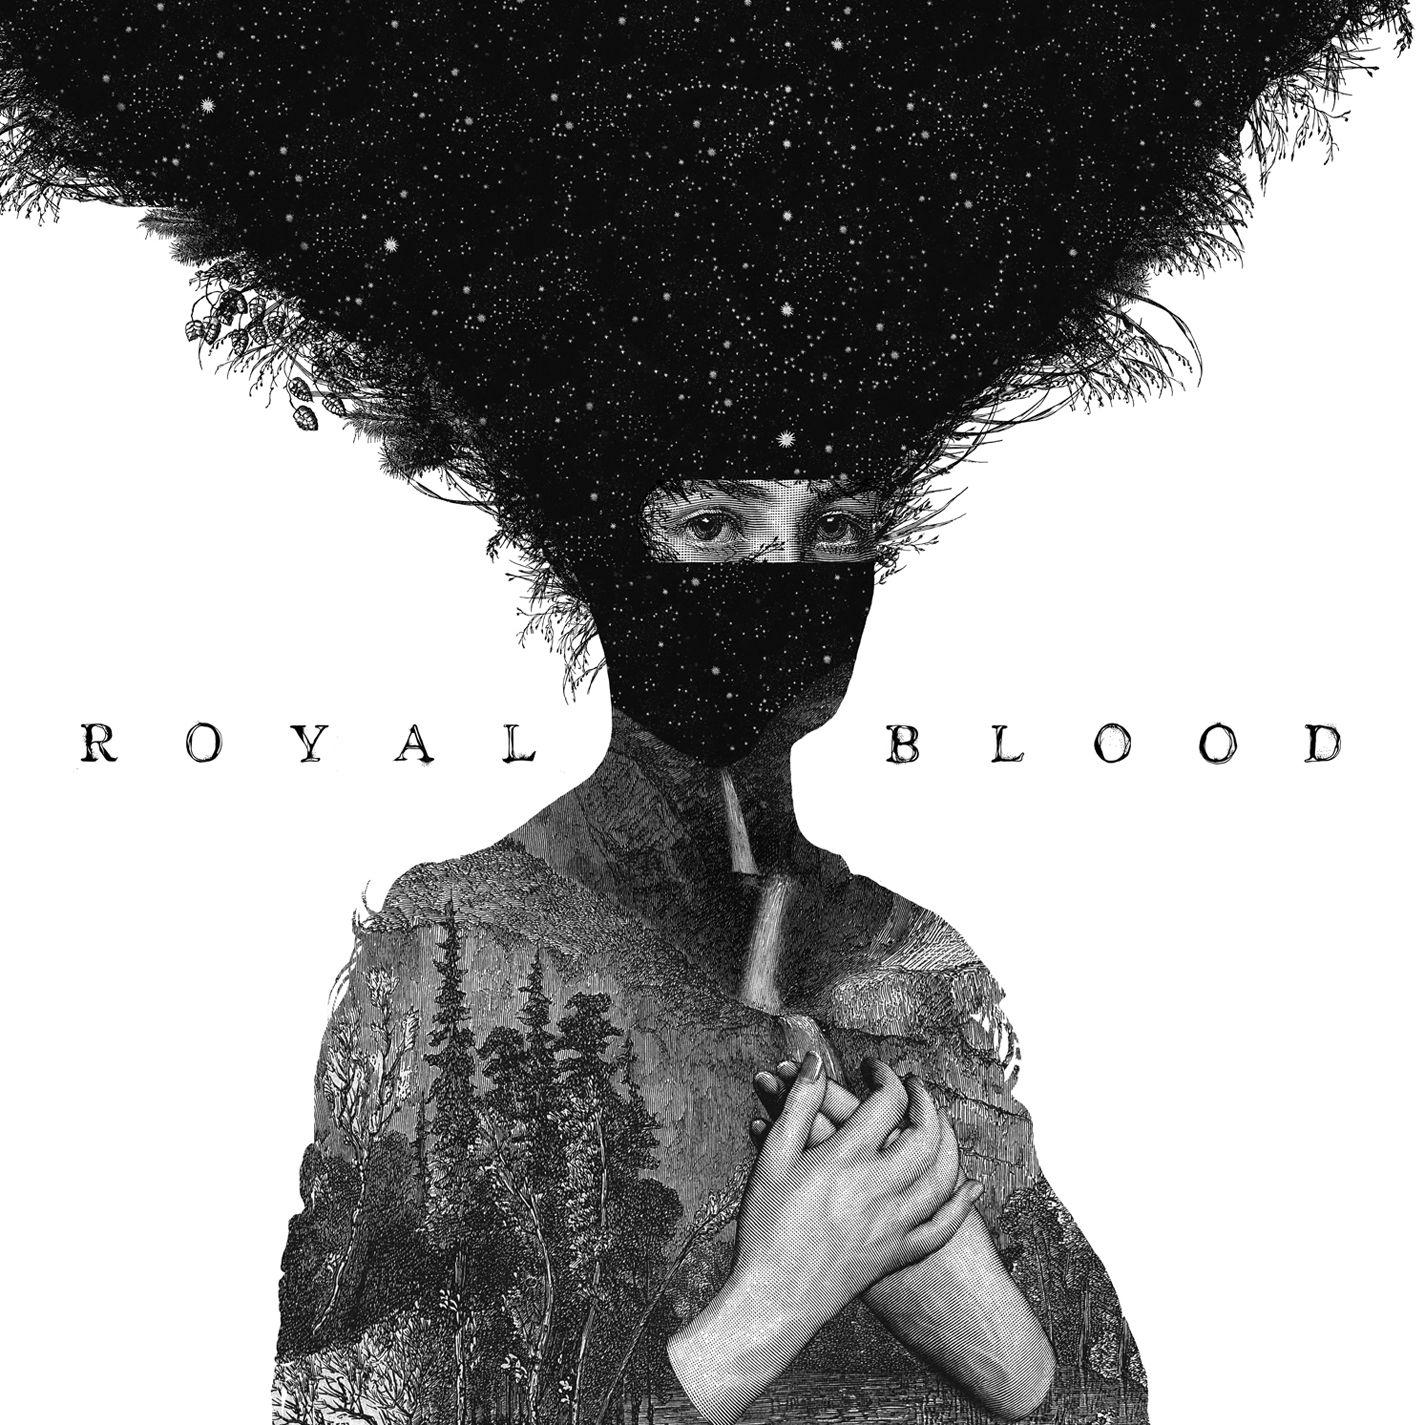 Royal_Blood_Royal_Blood